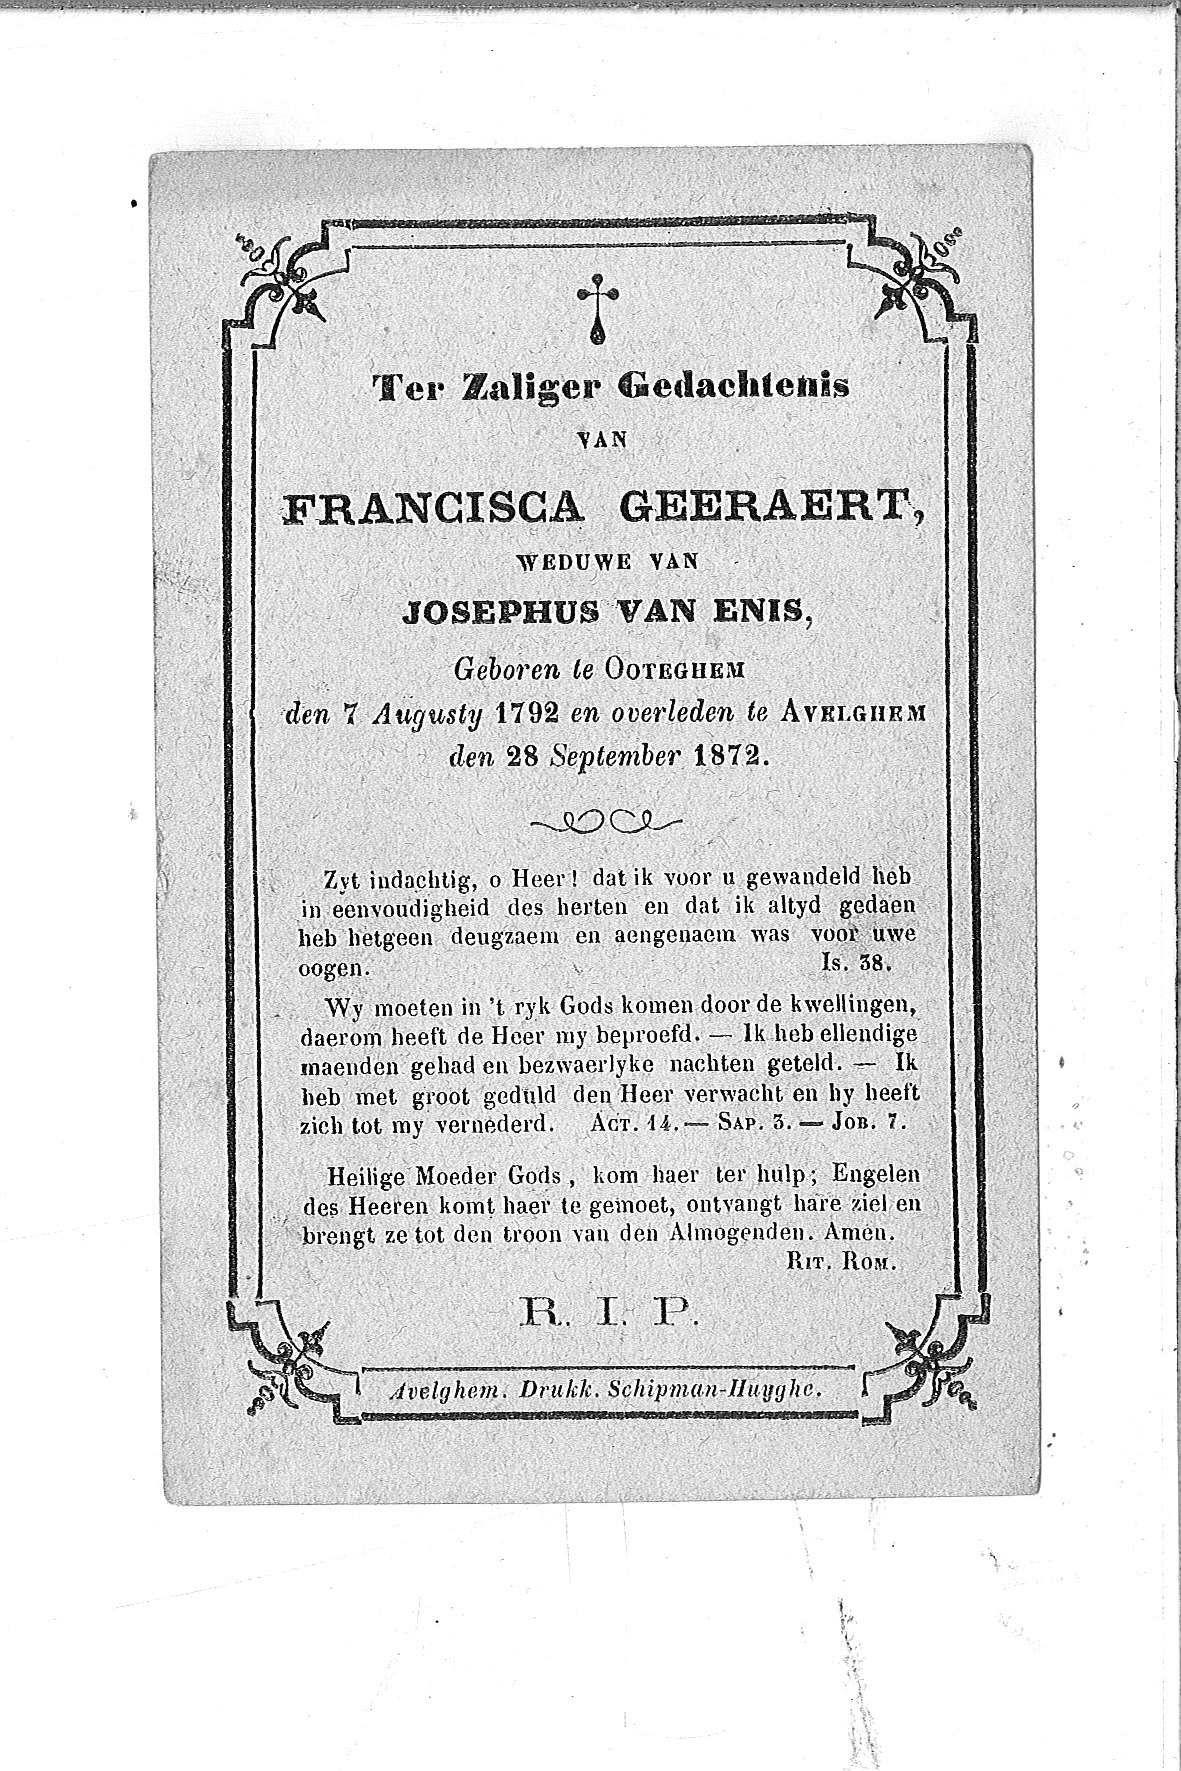 Francisca(1872)20130820111714_00009.jpg